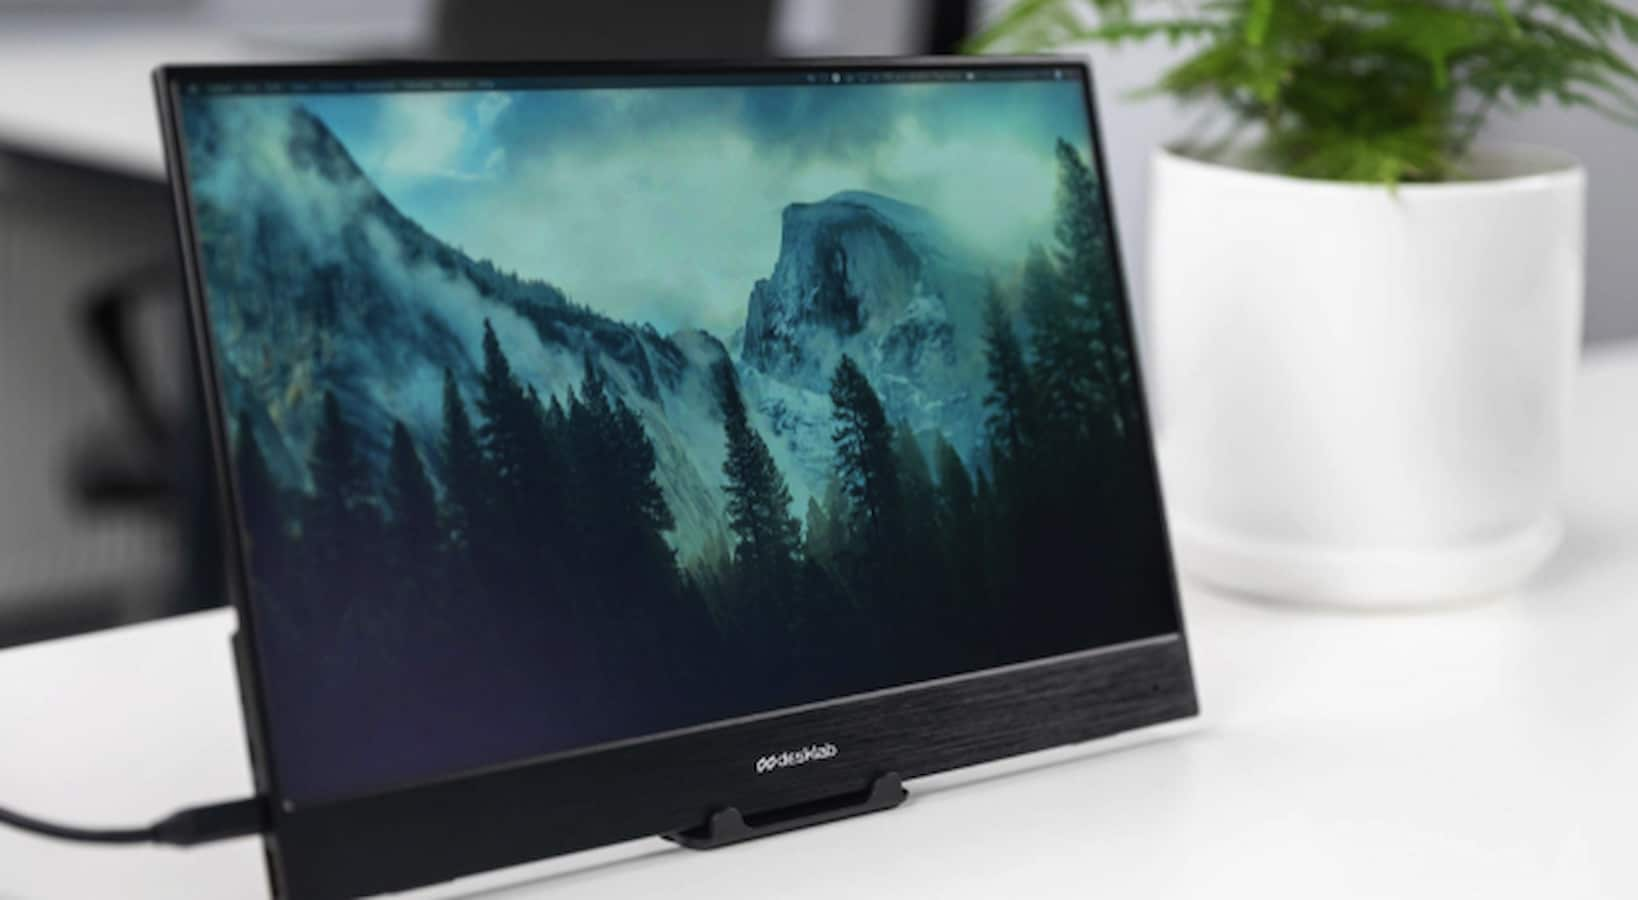 dlab 4k touchscreen monitor